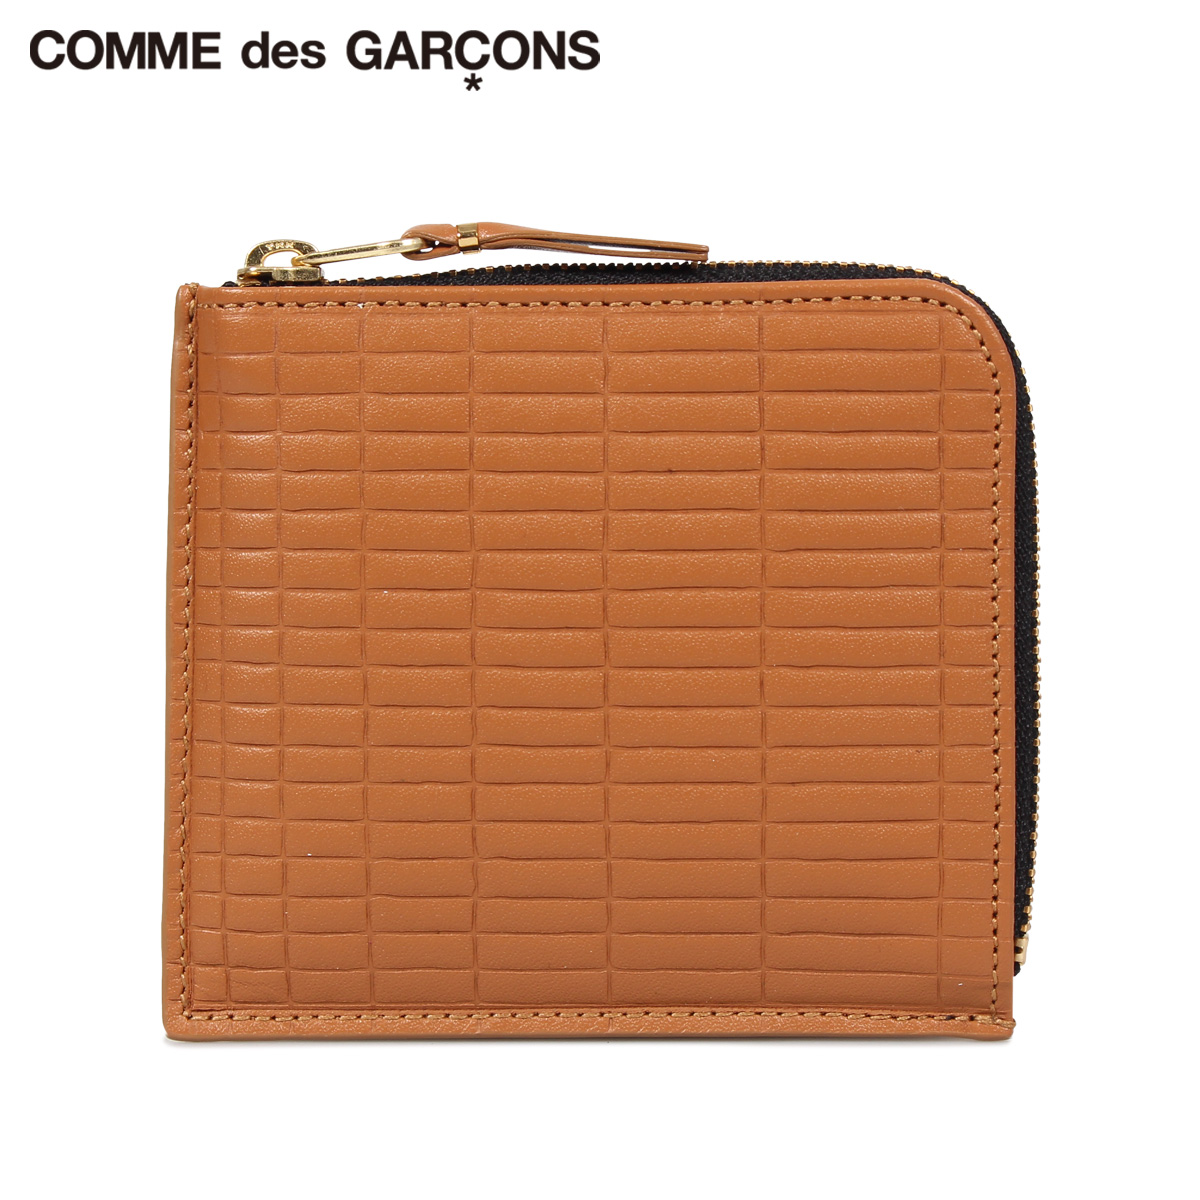 COMME des GARCONS BRICK WALLET コムデギャルソン 財布 ミニ財布 メンズ レディース L字ファスナー 本革 ベージュ SA3100BK